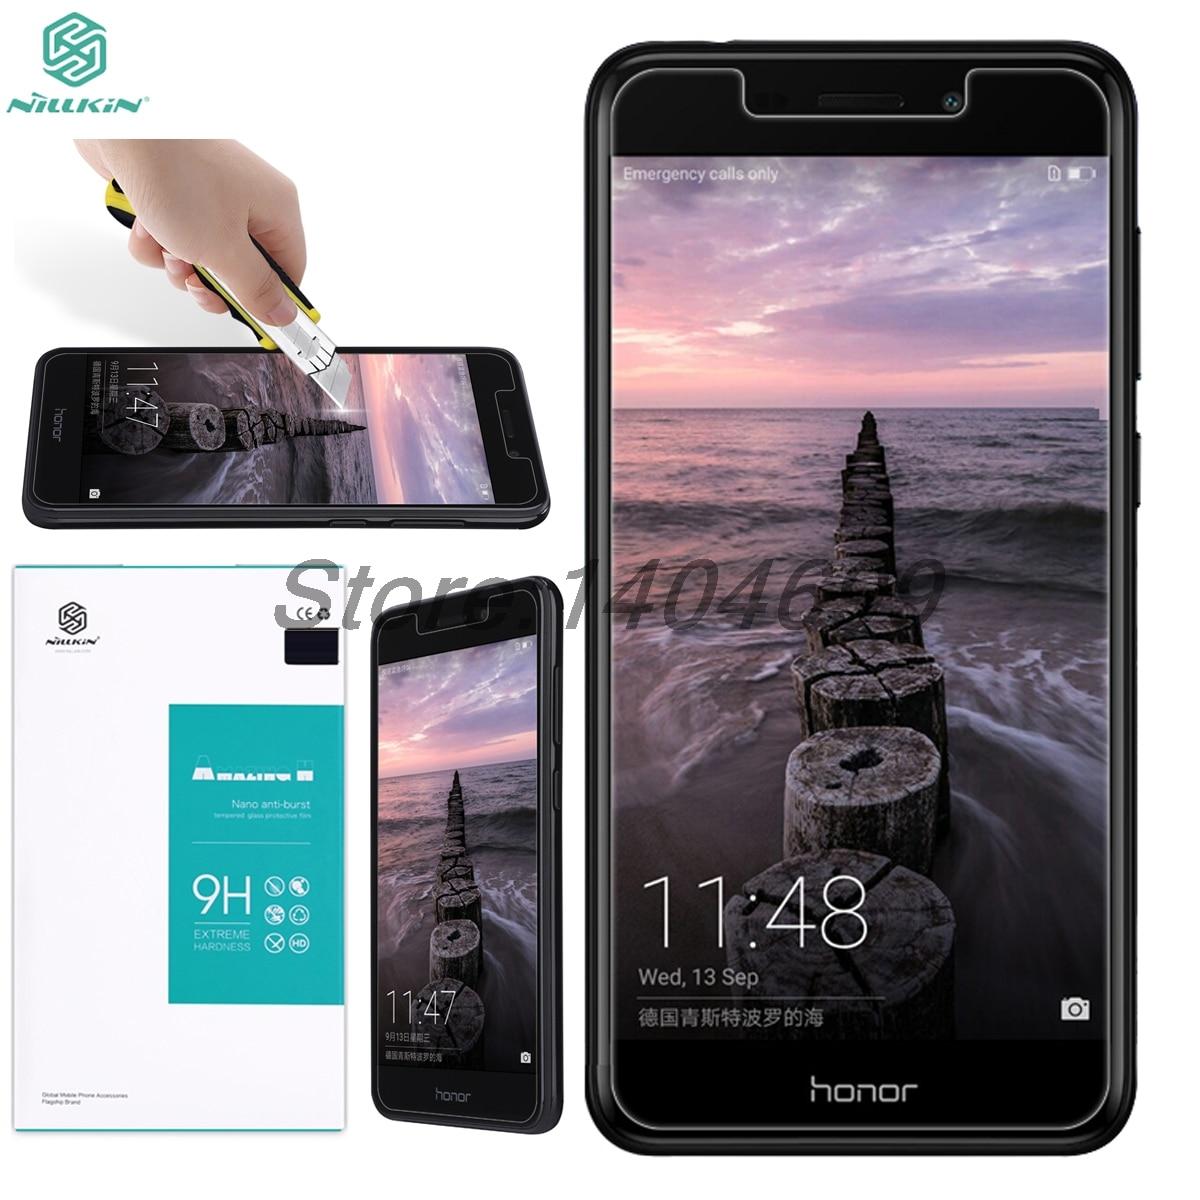 Защитная пленка для экрана Huawei Honor V9 Play закаленное стекло Nillkin Amazing H противоударное стекло для Huawei Honor V9 Play